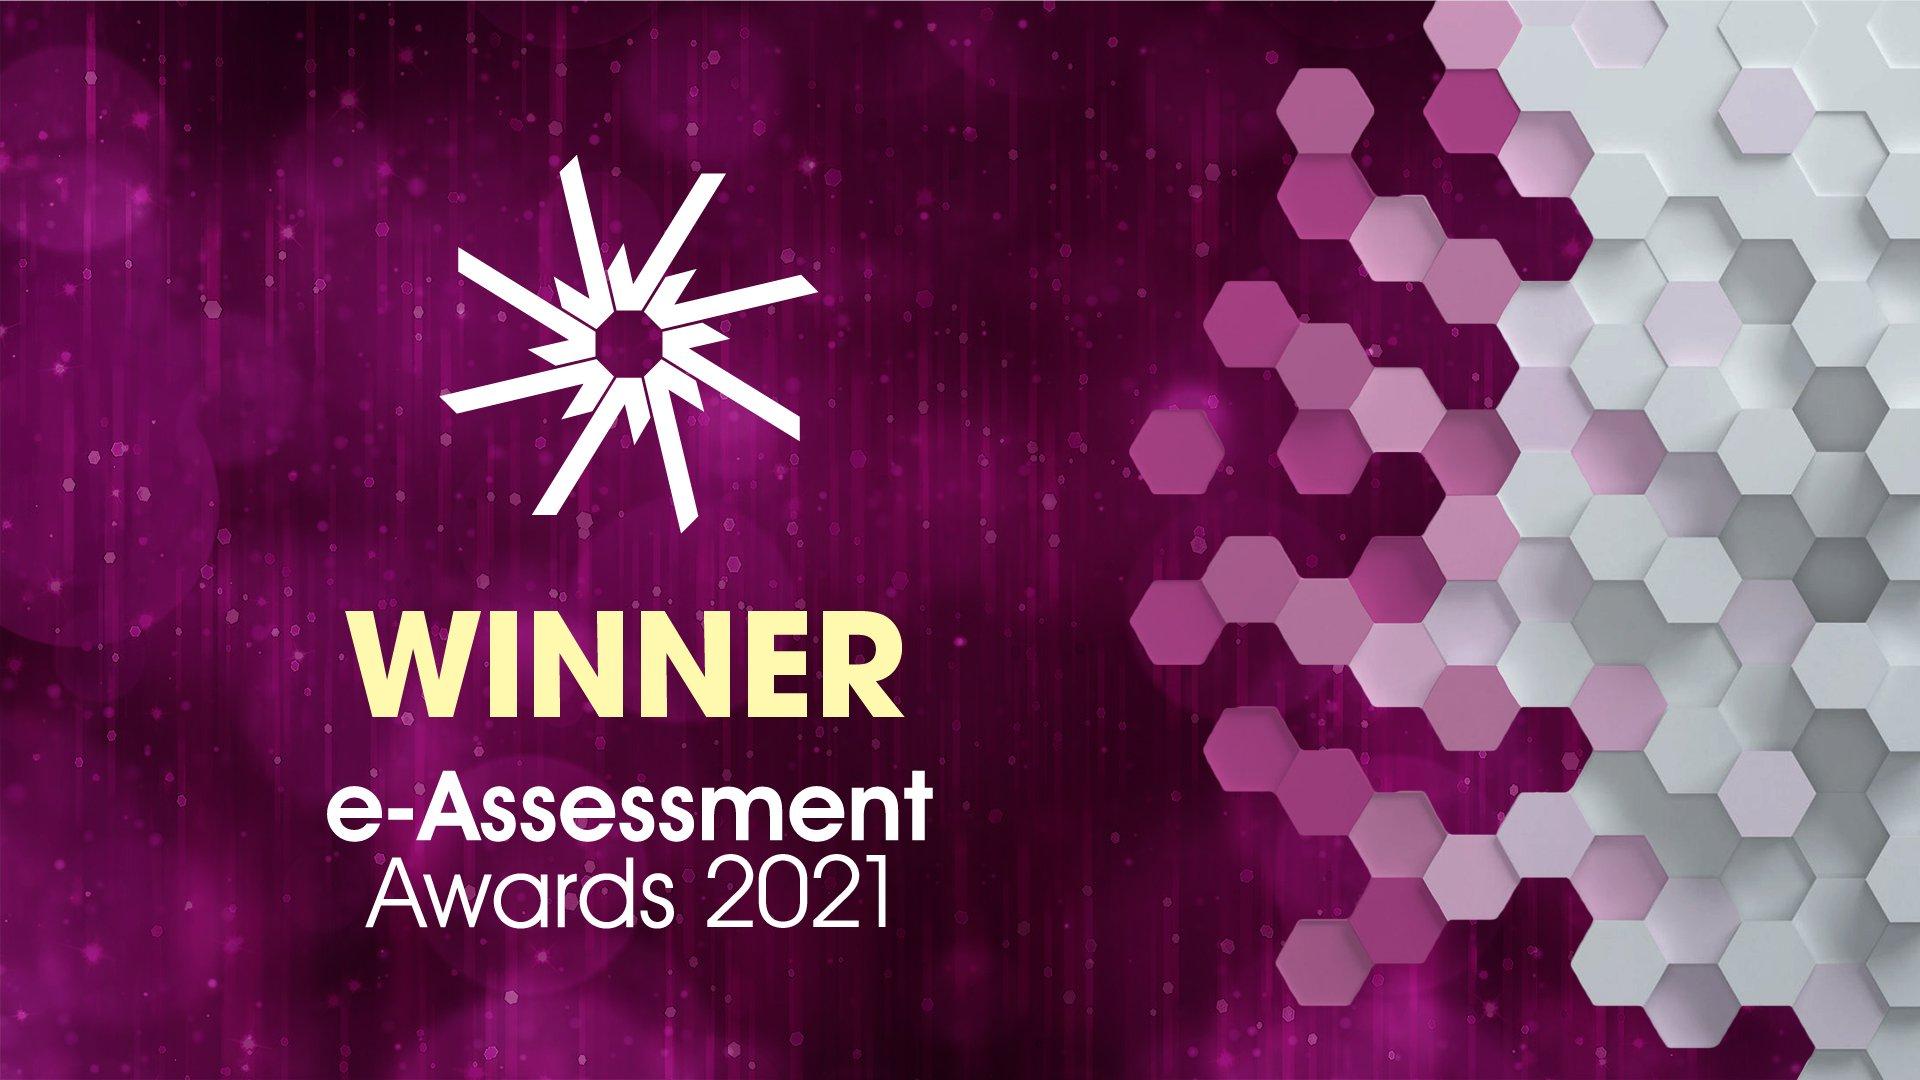 Case study from Excelsoft, winner of E-Assessment Award for Best International Implementation 2021